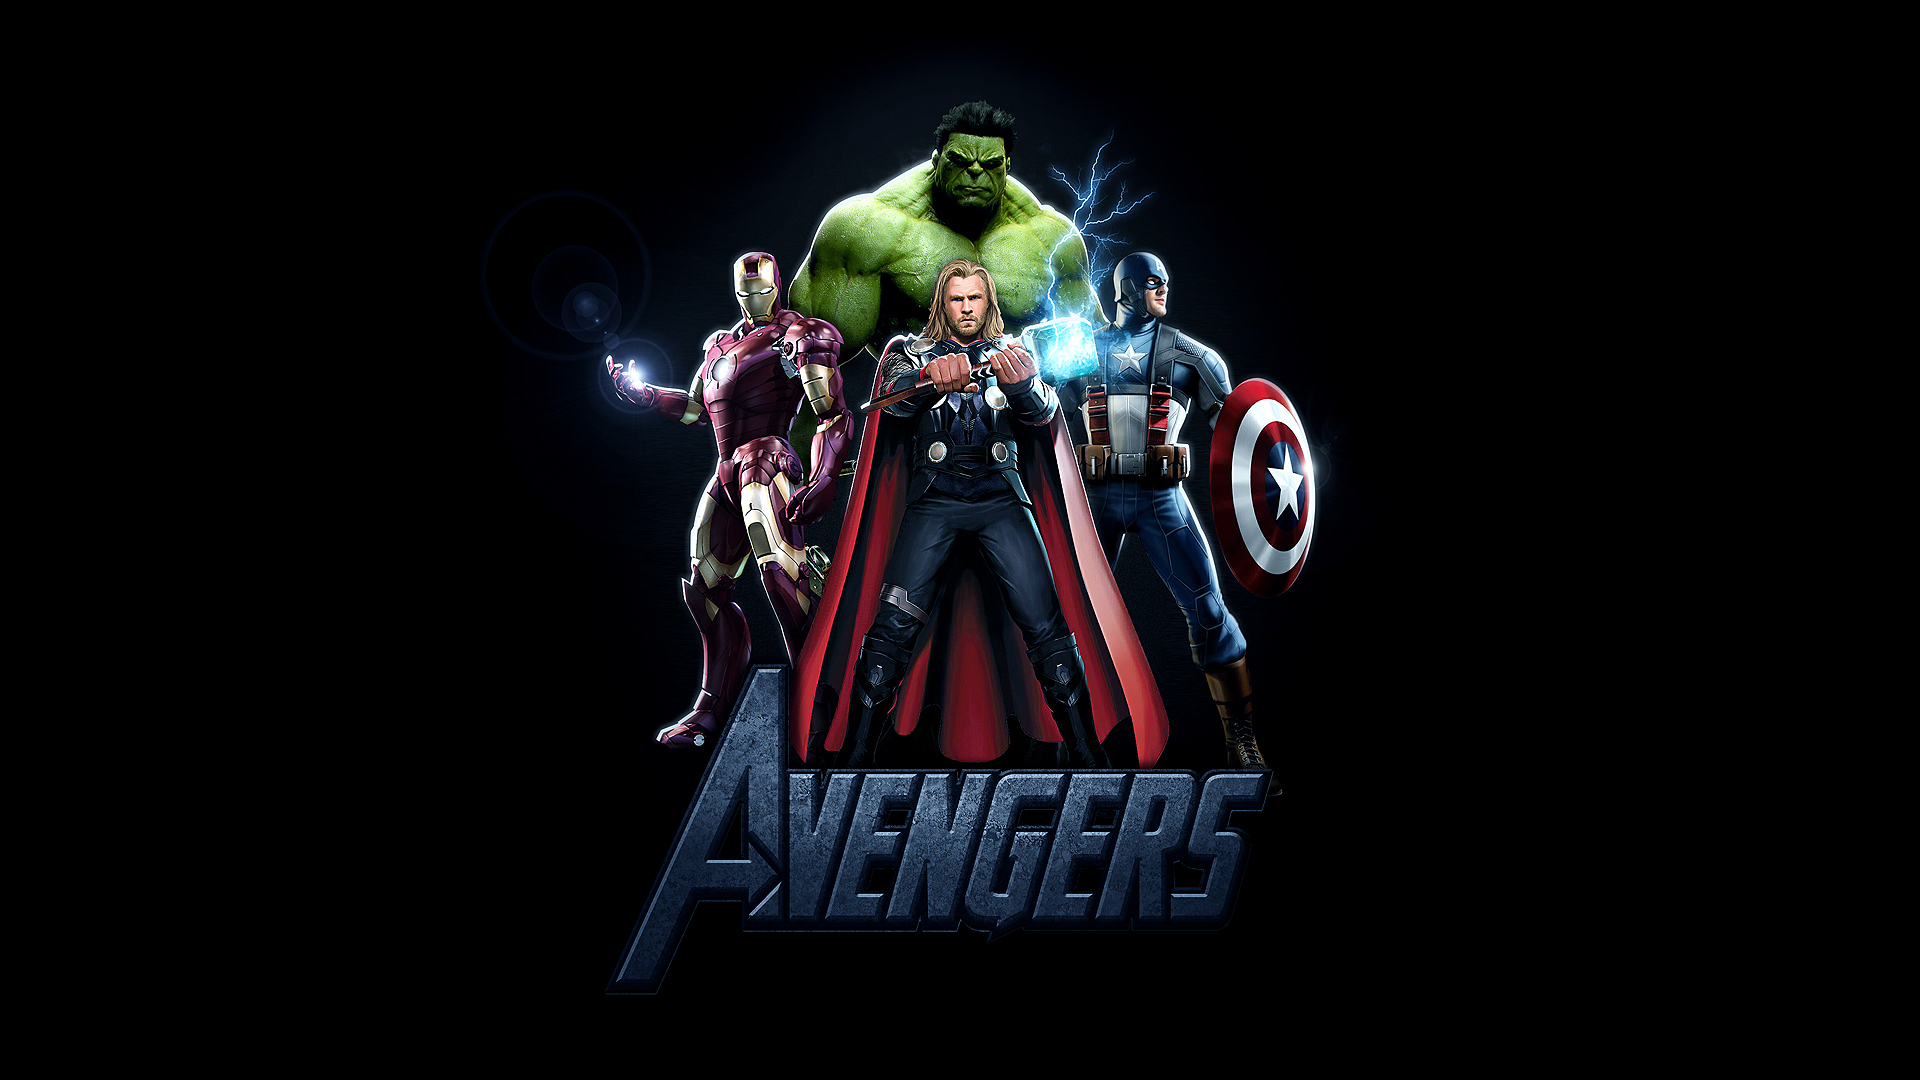 The Avengers Assemble   The Avengers Wallpaper 21474271 1920x1080